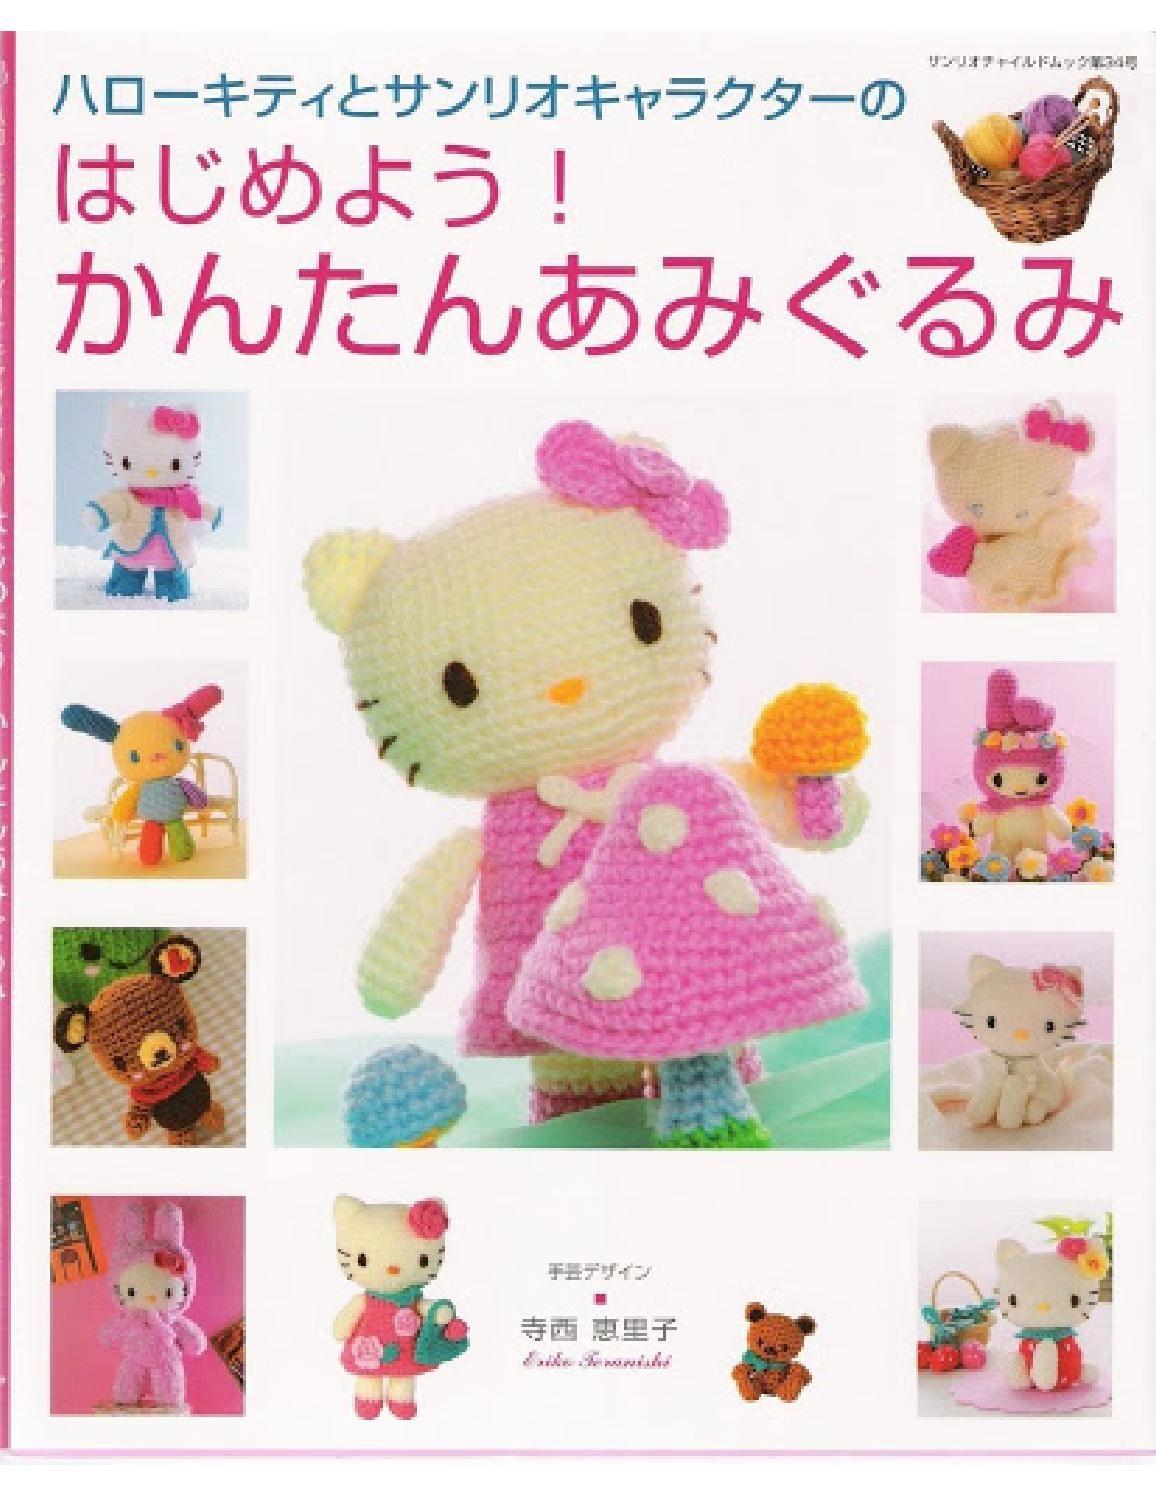 Sanrio hello kitty crochet amigurumi   libros   Pinterest   Libros ...